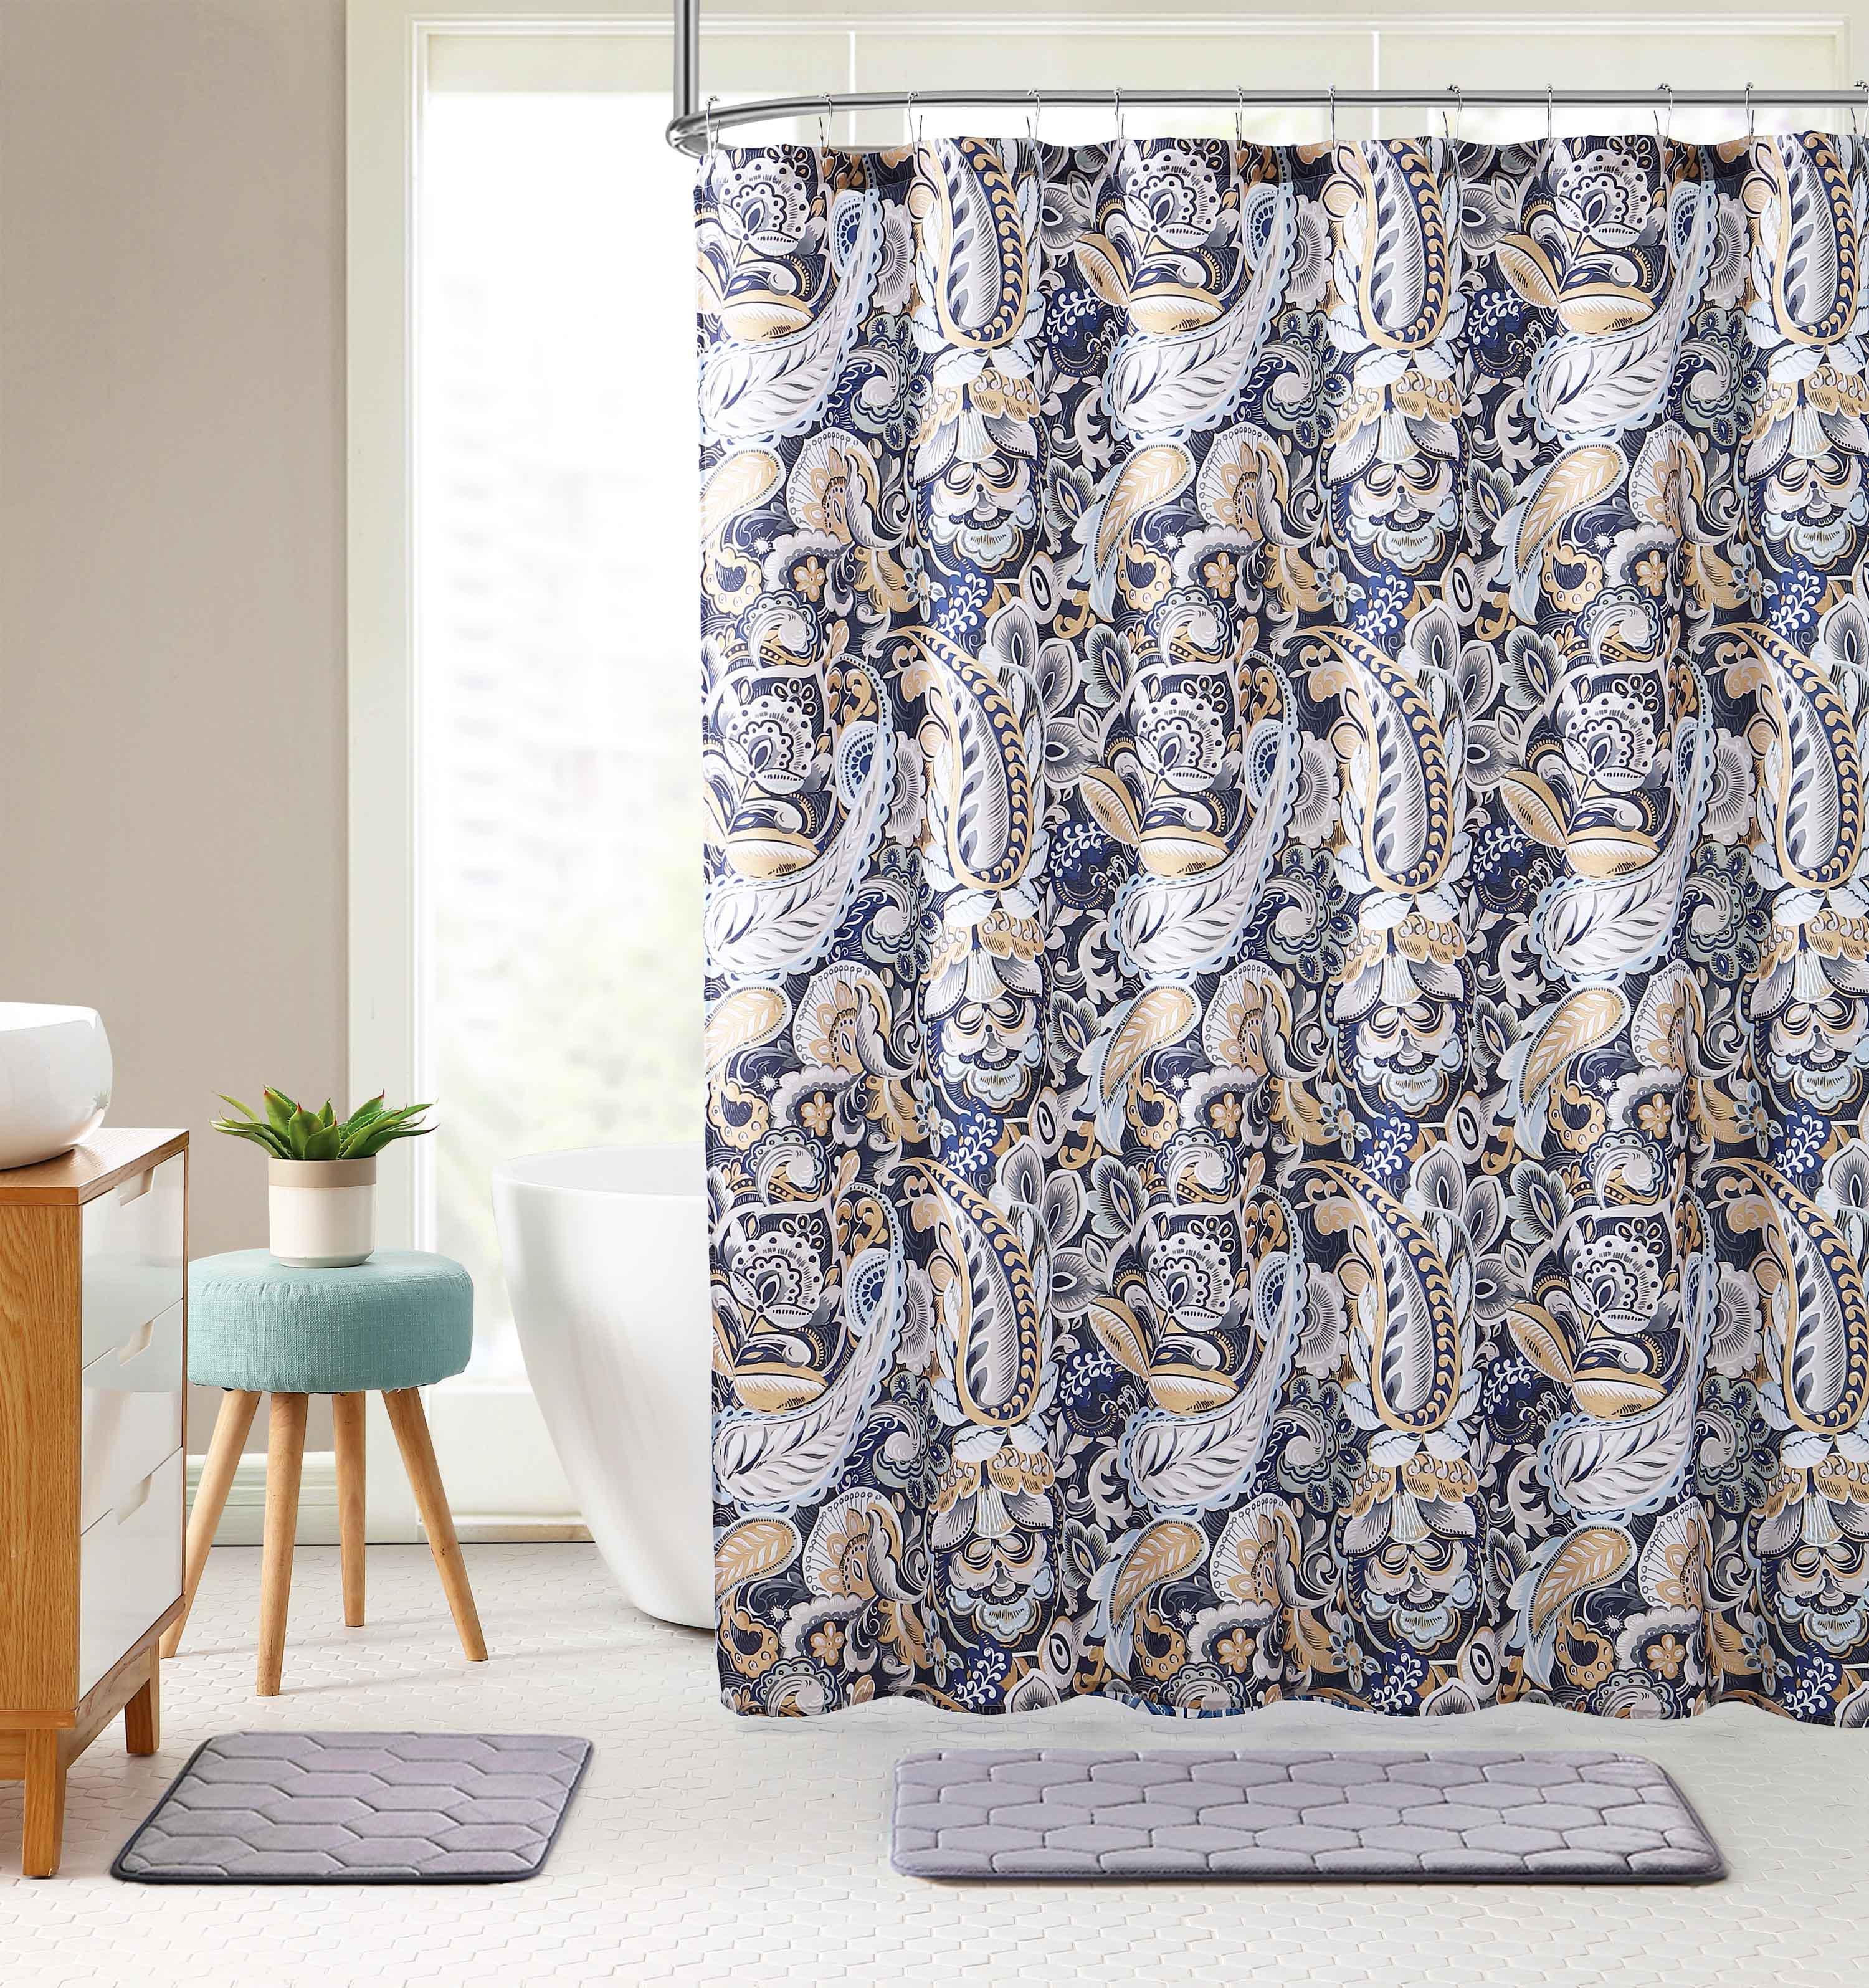 elegant navy blue beige fabric shower curtain large floral paisley print design 72 x 72 inch walmart com